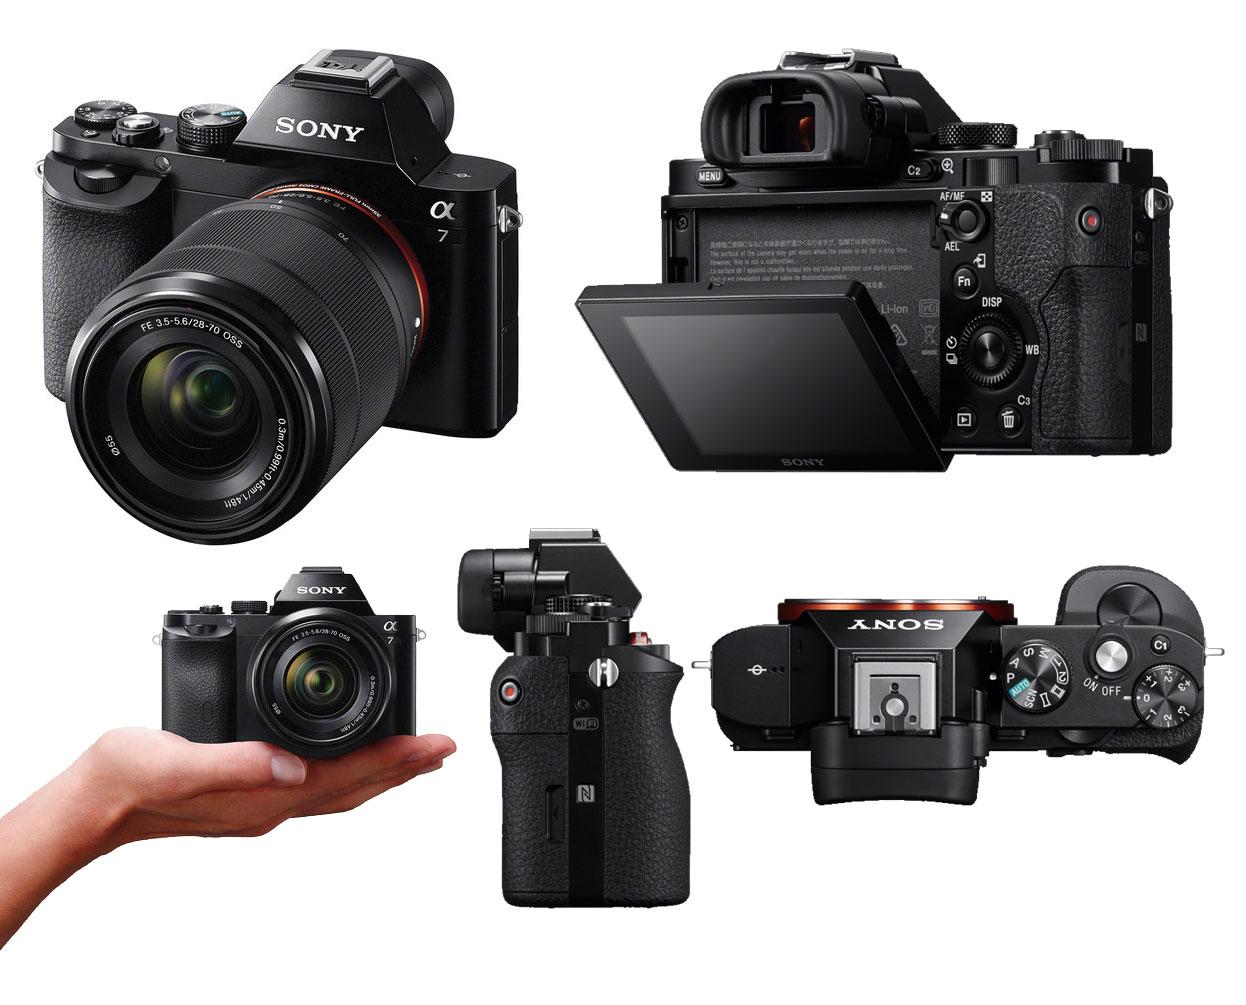 HDSLR Cameras | Digital SLR Cameras | Hunt's Photo & Video